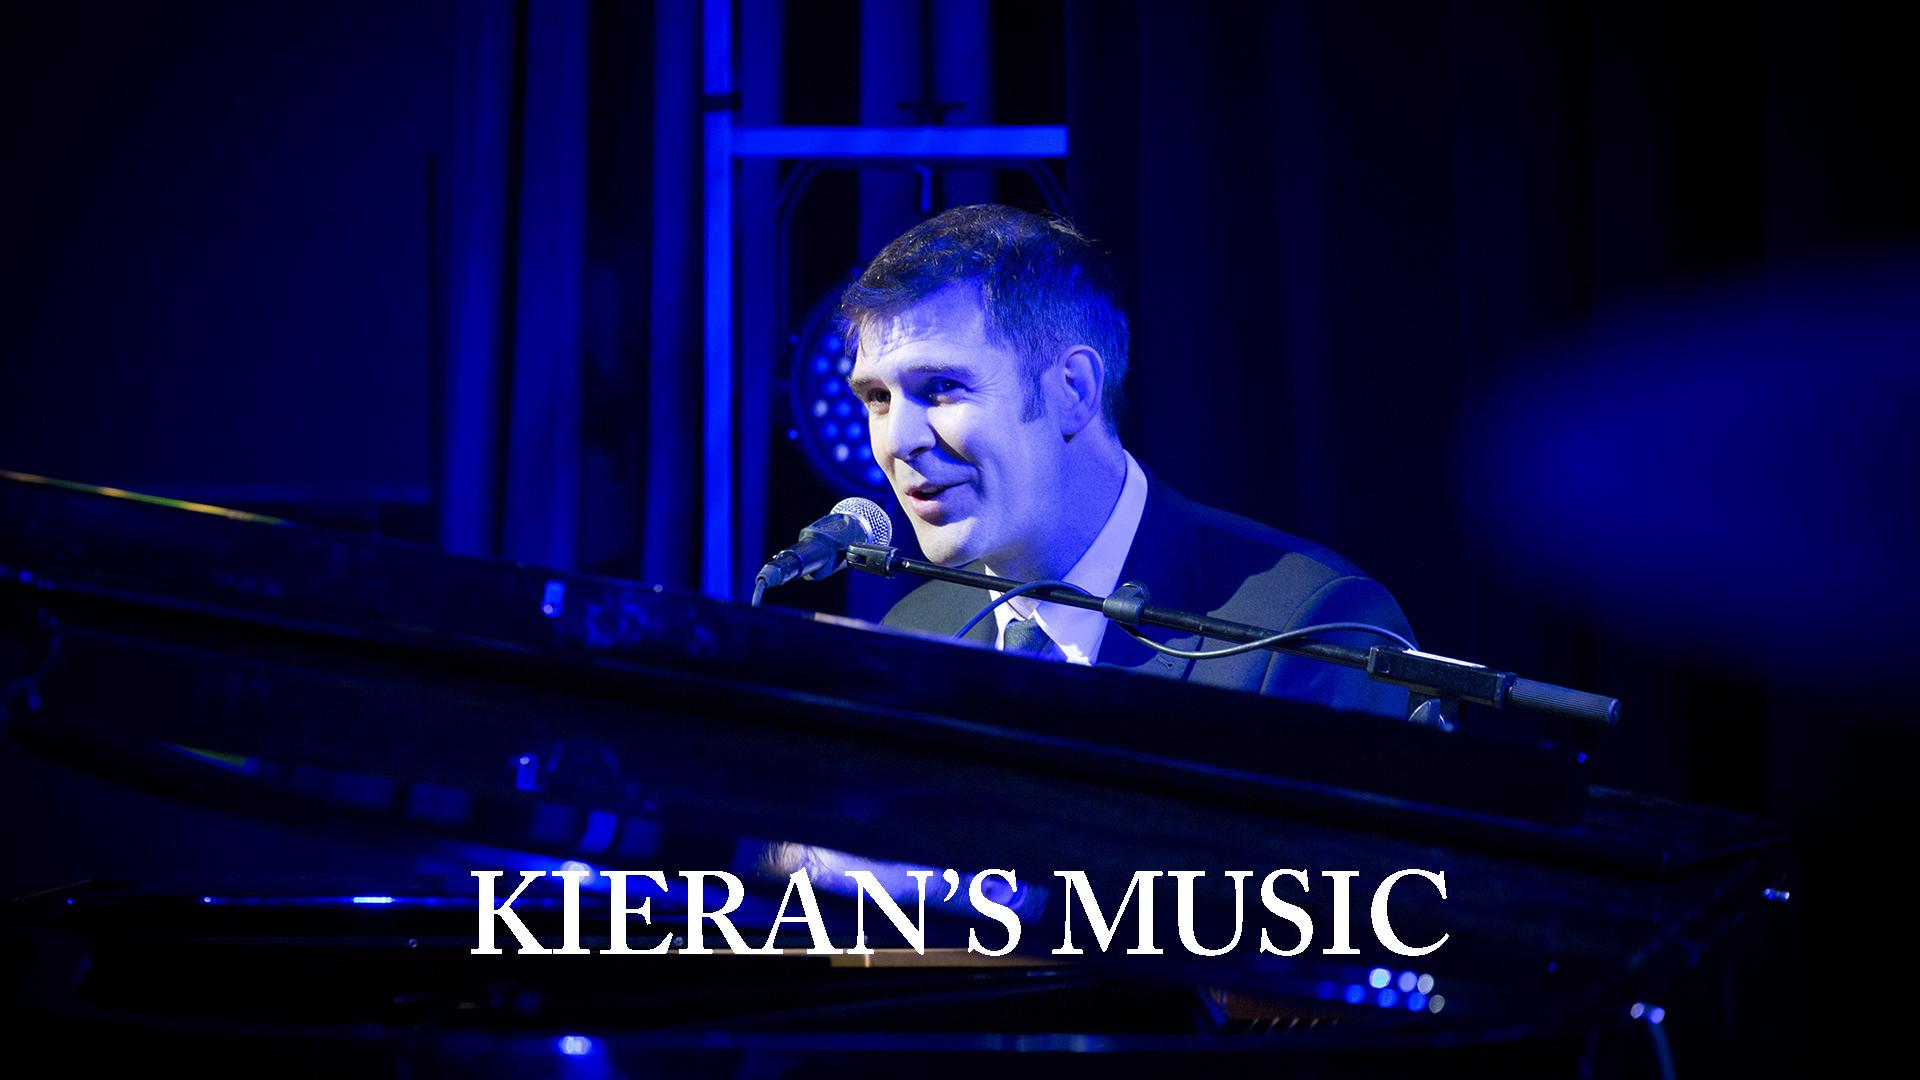 Kierans music.jpg